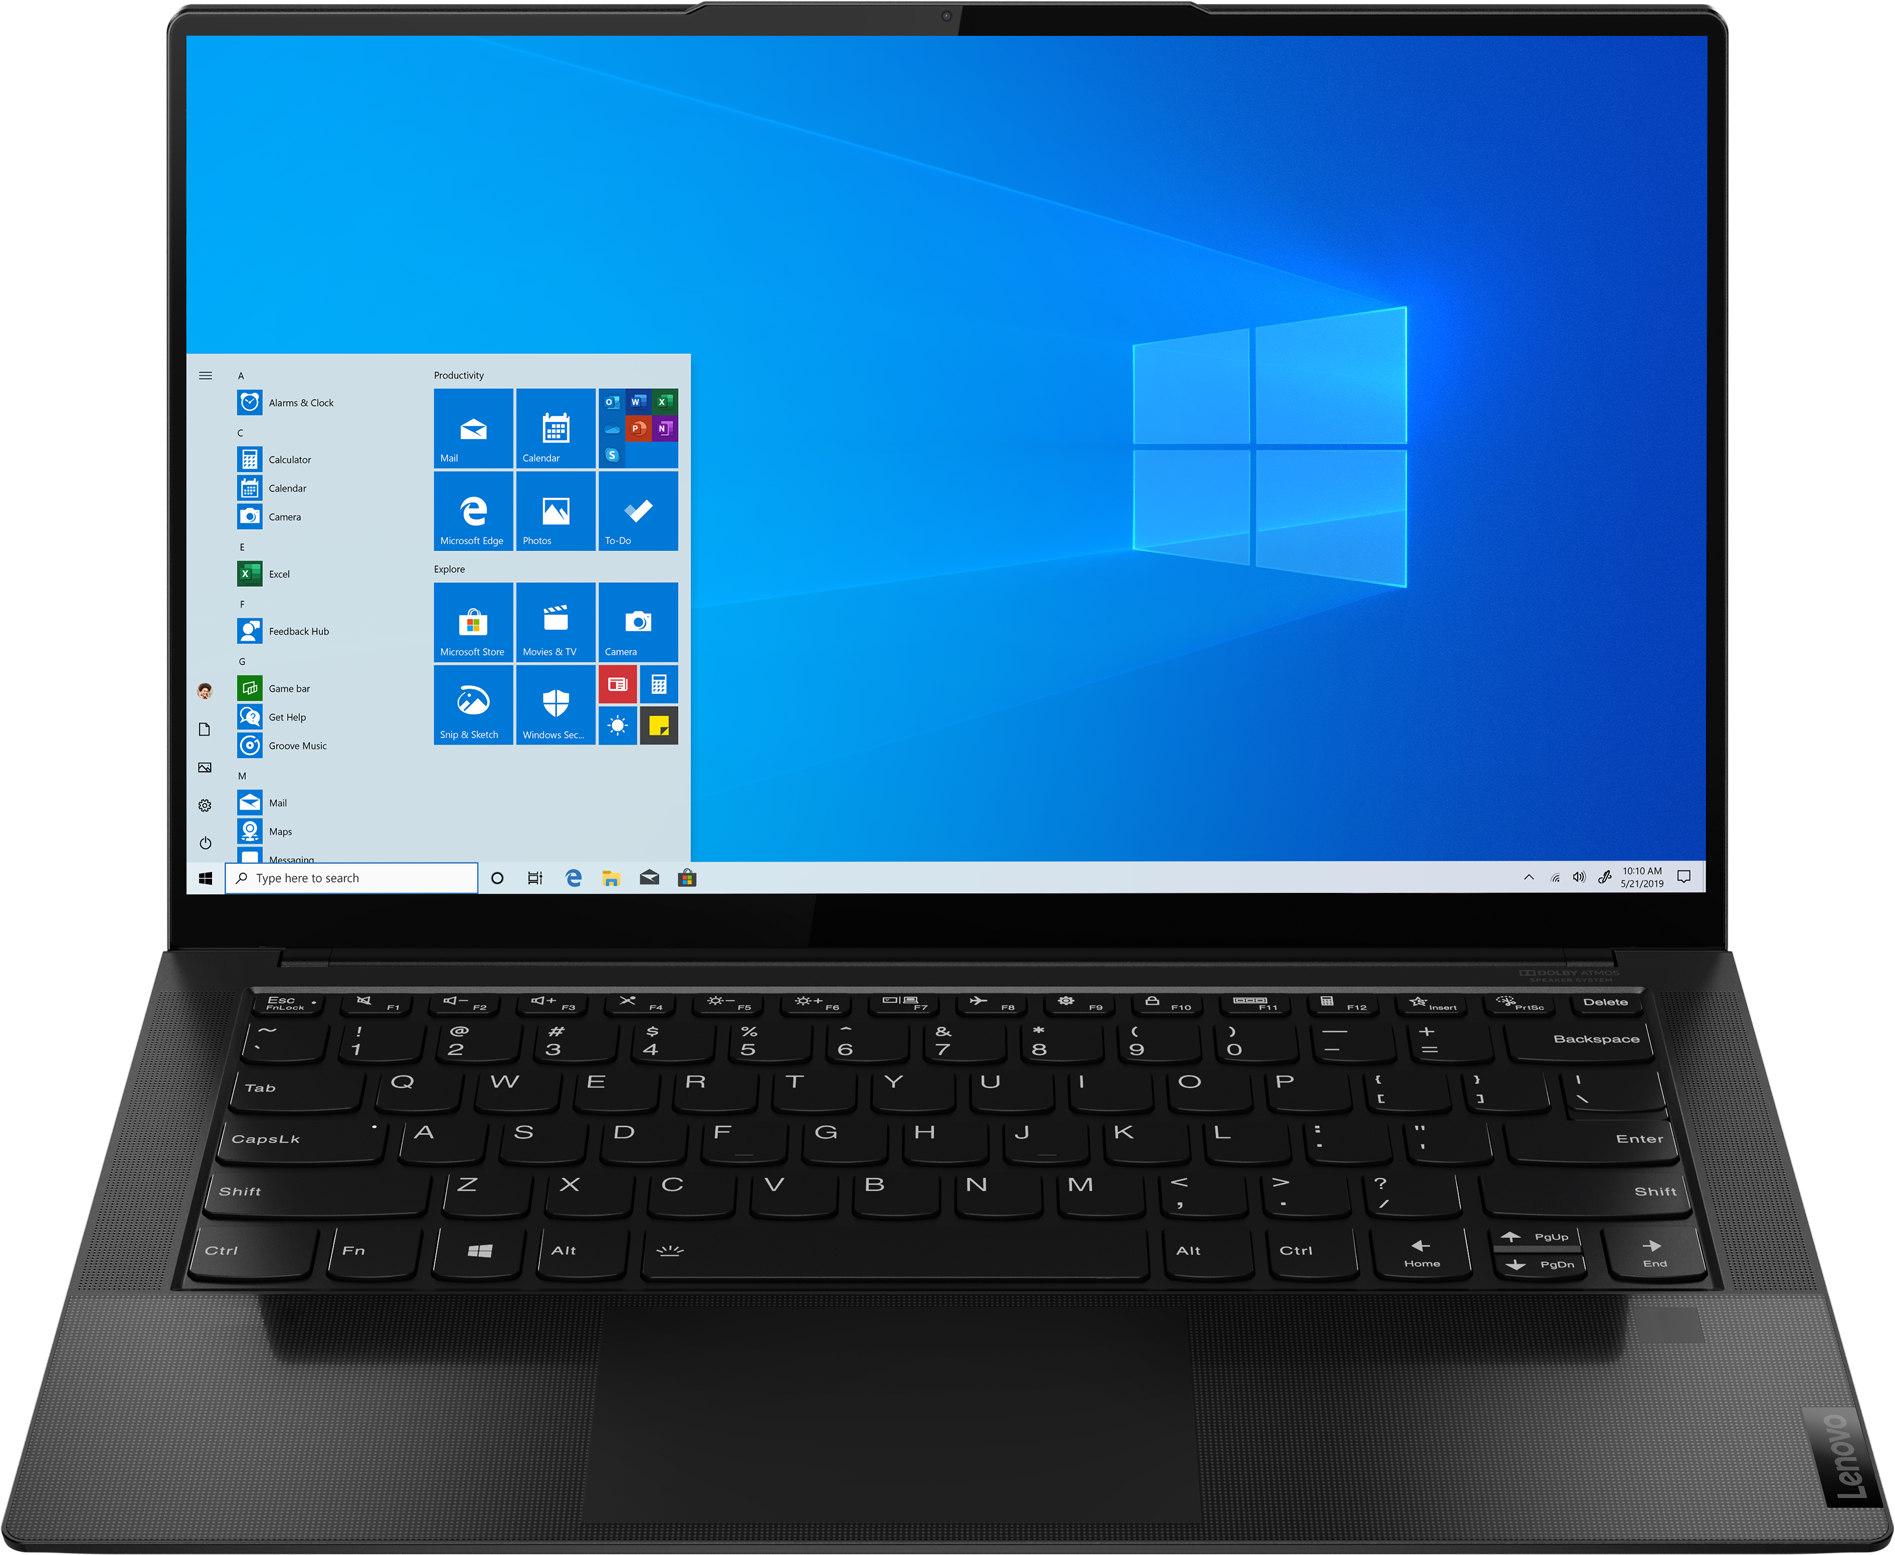 Lenovo IdeaPad Slim 9i 82D2000BUS Laptop